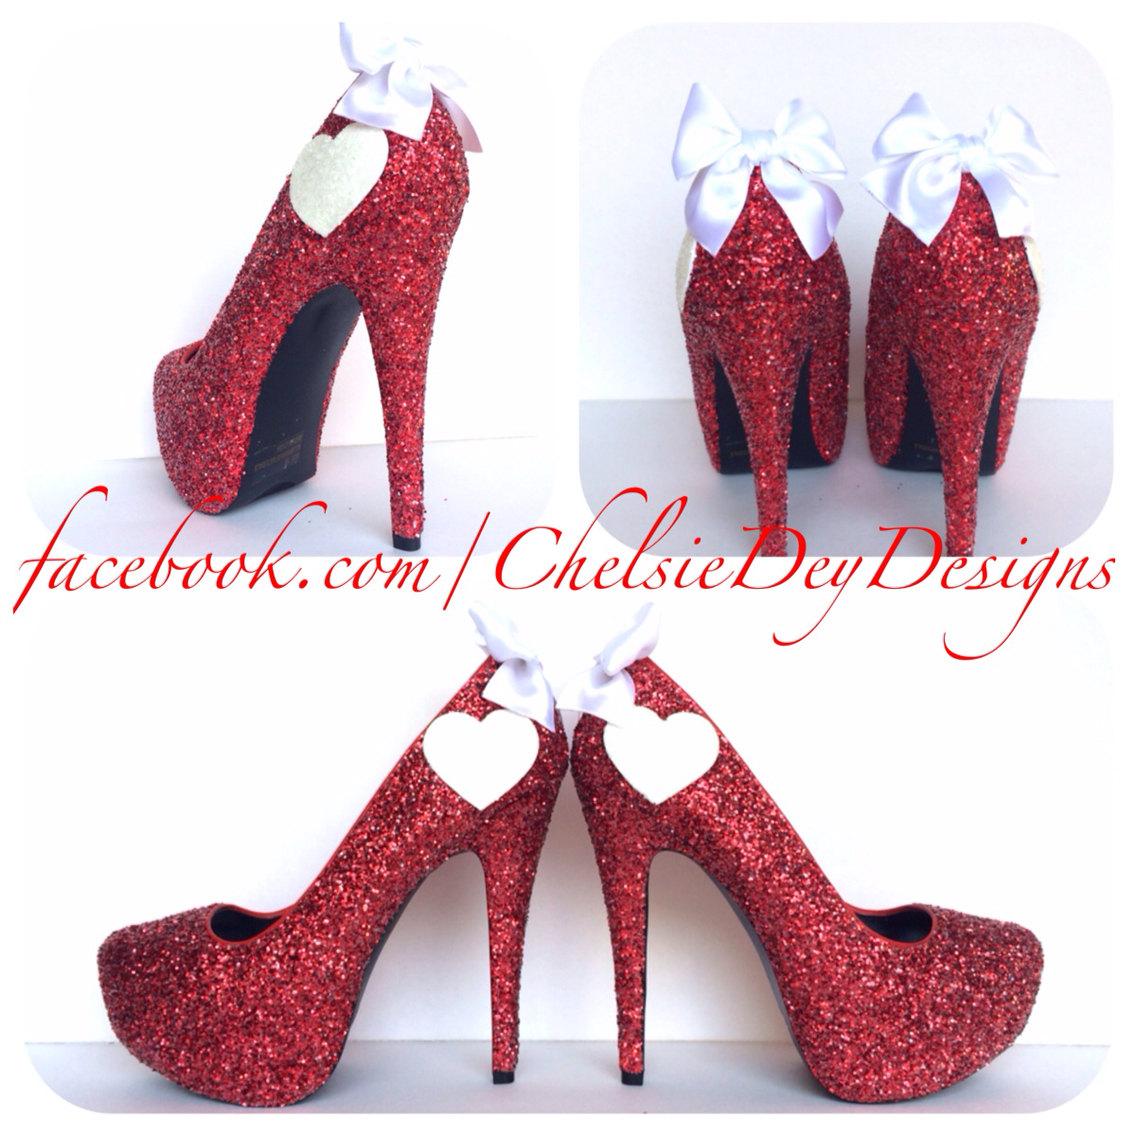 5dee475d8ba1a Glitter High Heels - Red Pumps - Pomegranate Platform Shoes - White Hearts  - Glitzy Wedding Bridal Heels - White Satin Bows from Chelsie Dey Designs